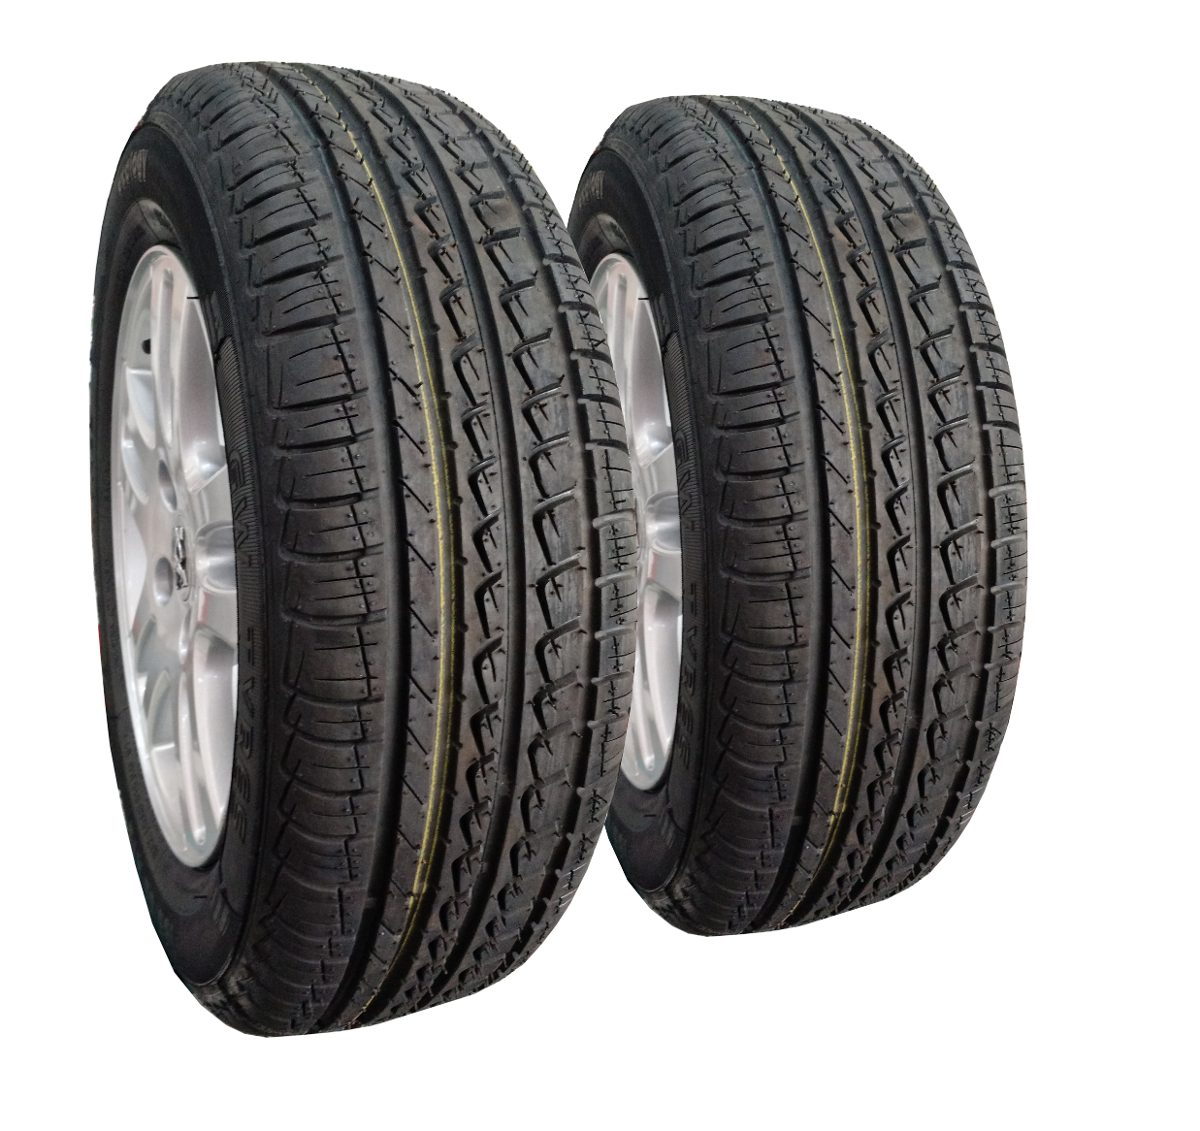 kit 2 pneu 195 65 r15 remold gw tyre pirelli 5 anos garantia r 405 00 em mercado livre. Black Bedroom Furniture Sets. Home Design Ideas